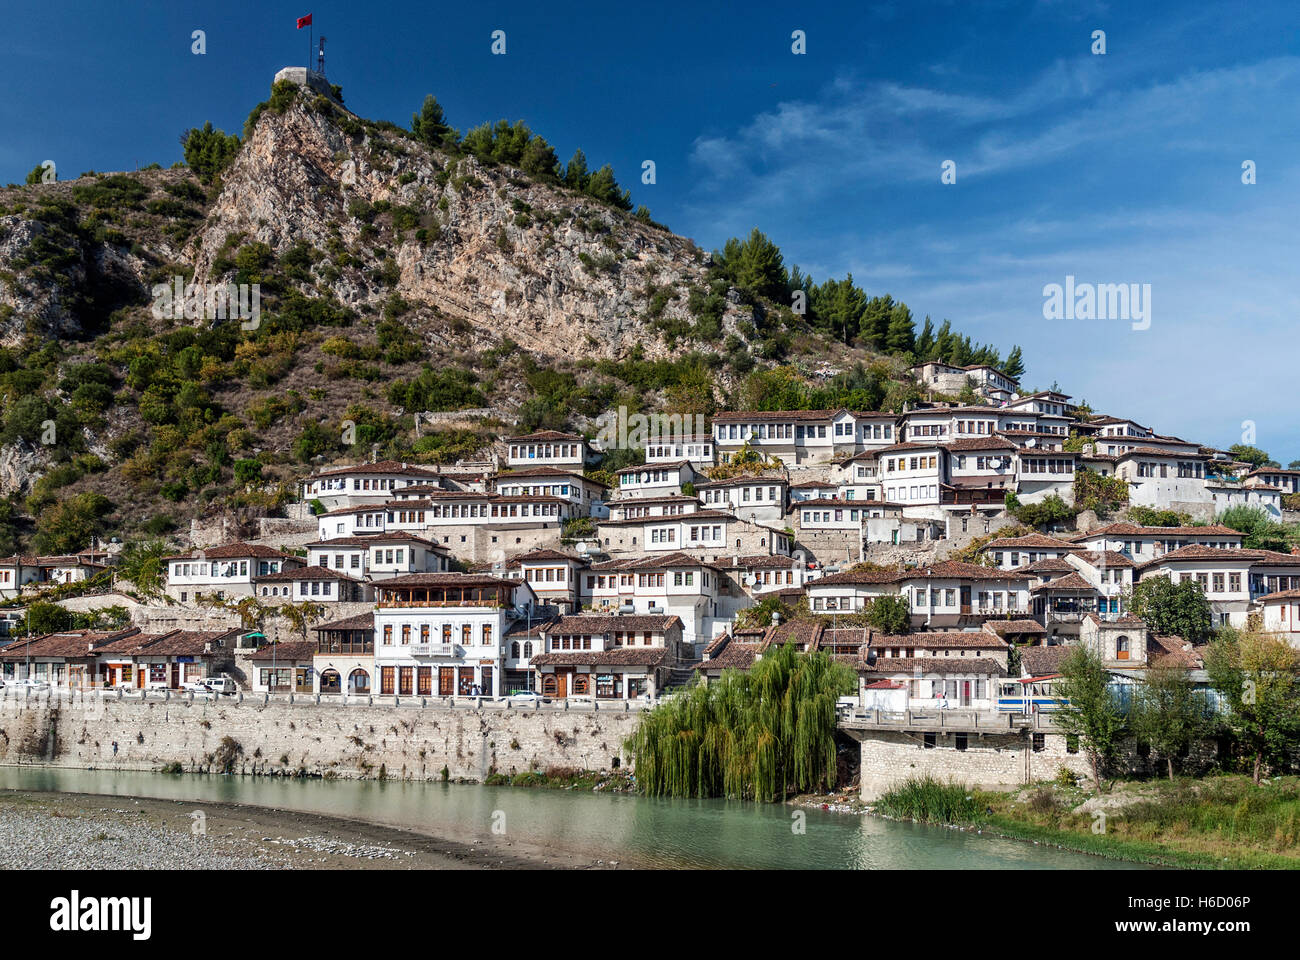 traditional balkan houses in historic old town of berat albania - Stock Image